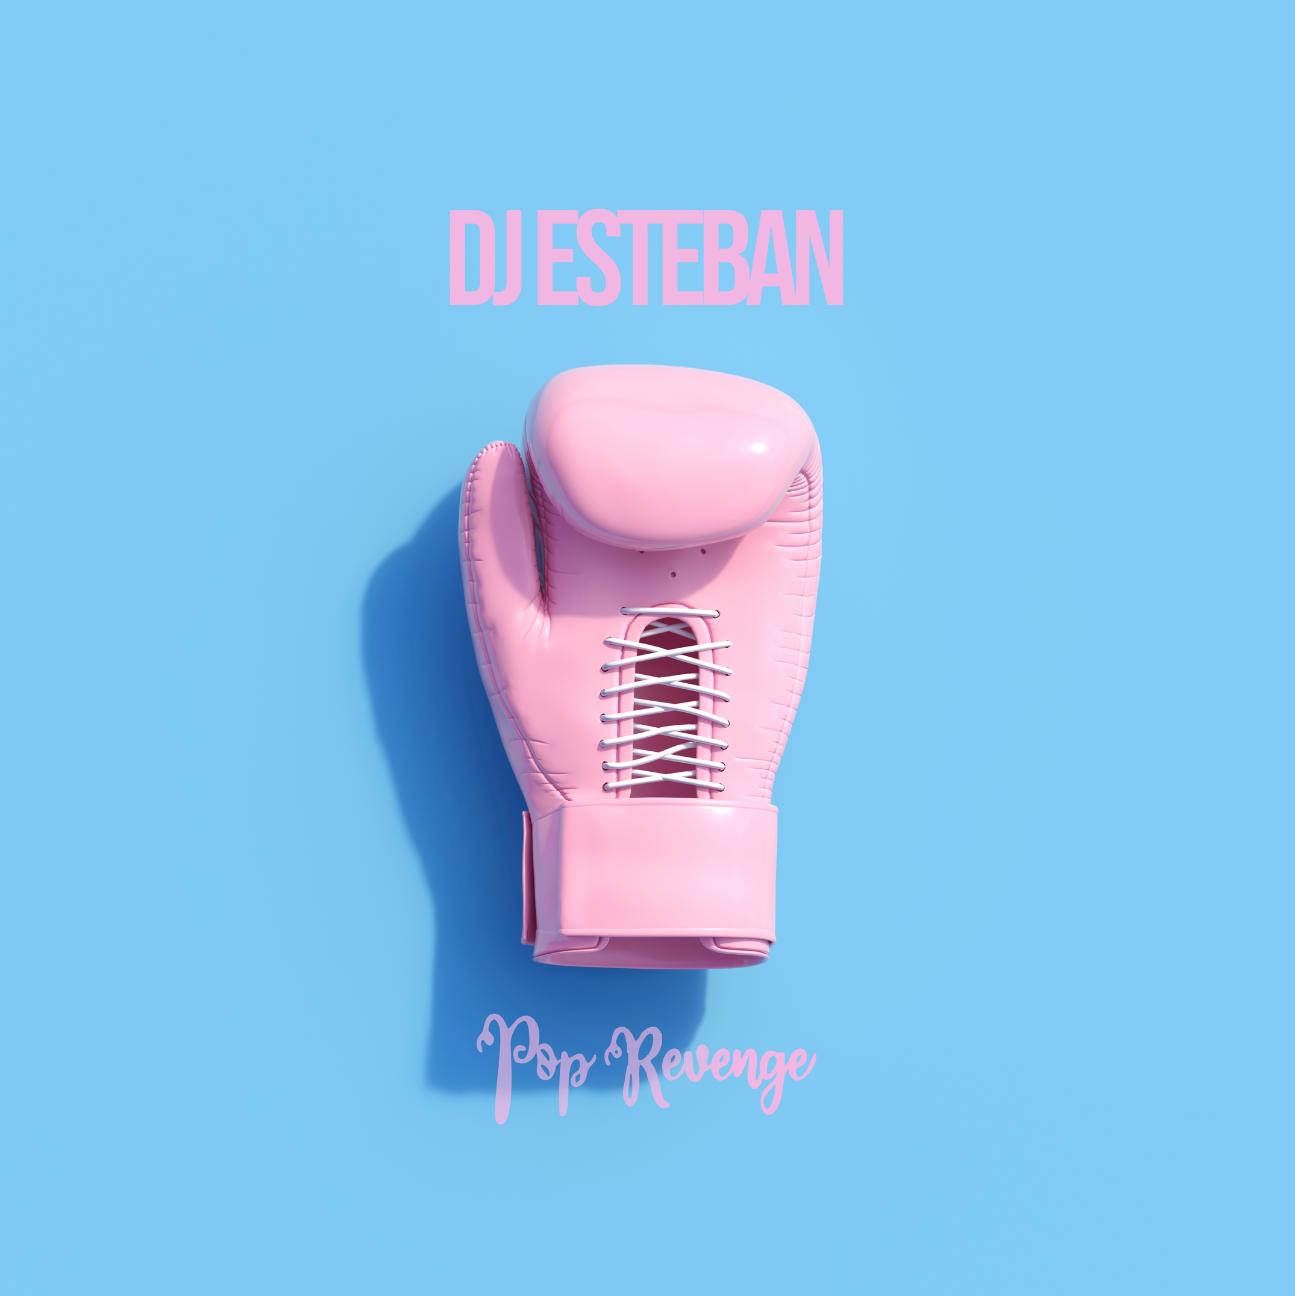 DJ ESTEBAN, As a Human Music Machine, releases POP REVENGE 23